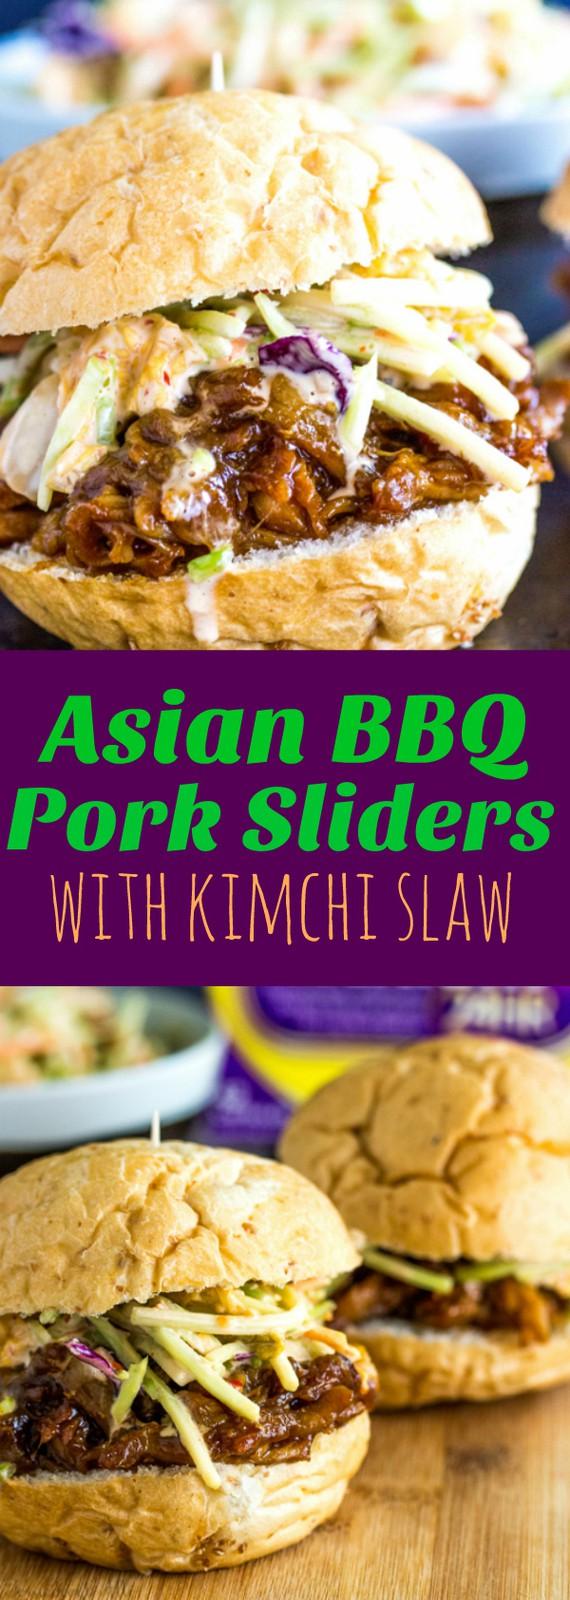 Slow Cooker Asian BBQ Pork Slides wih Kimchi Slaw